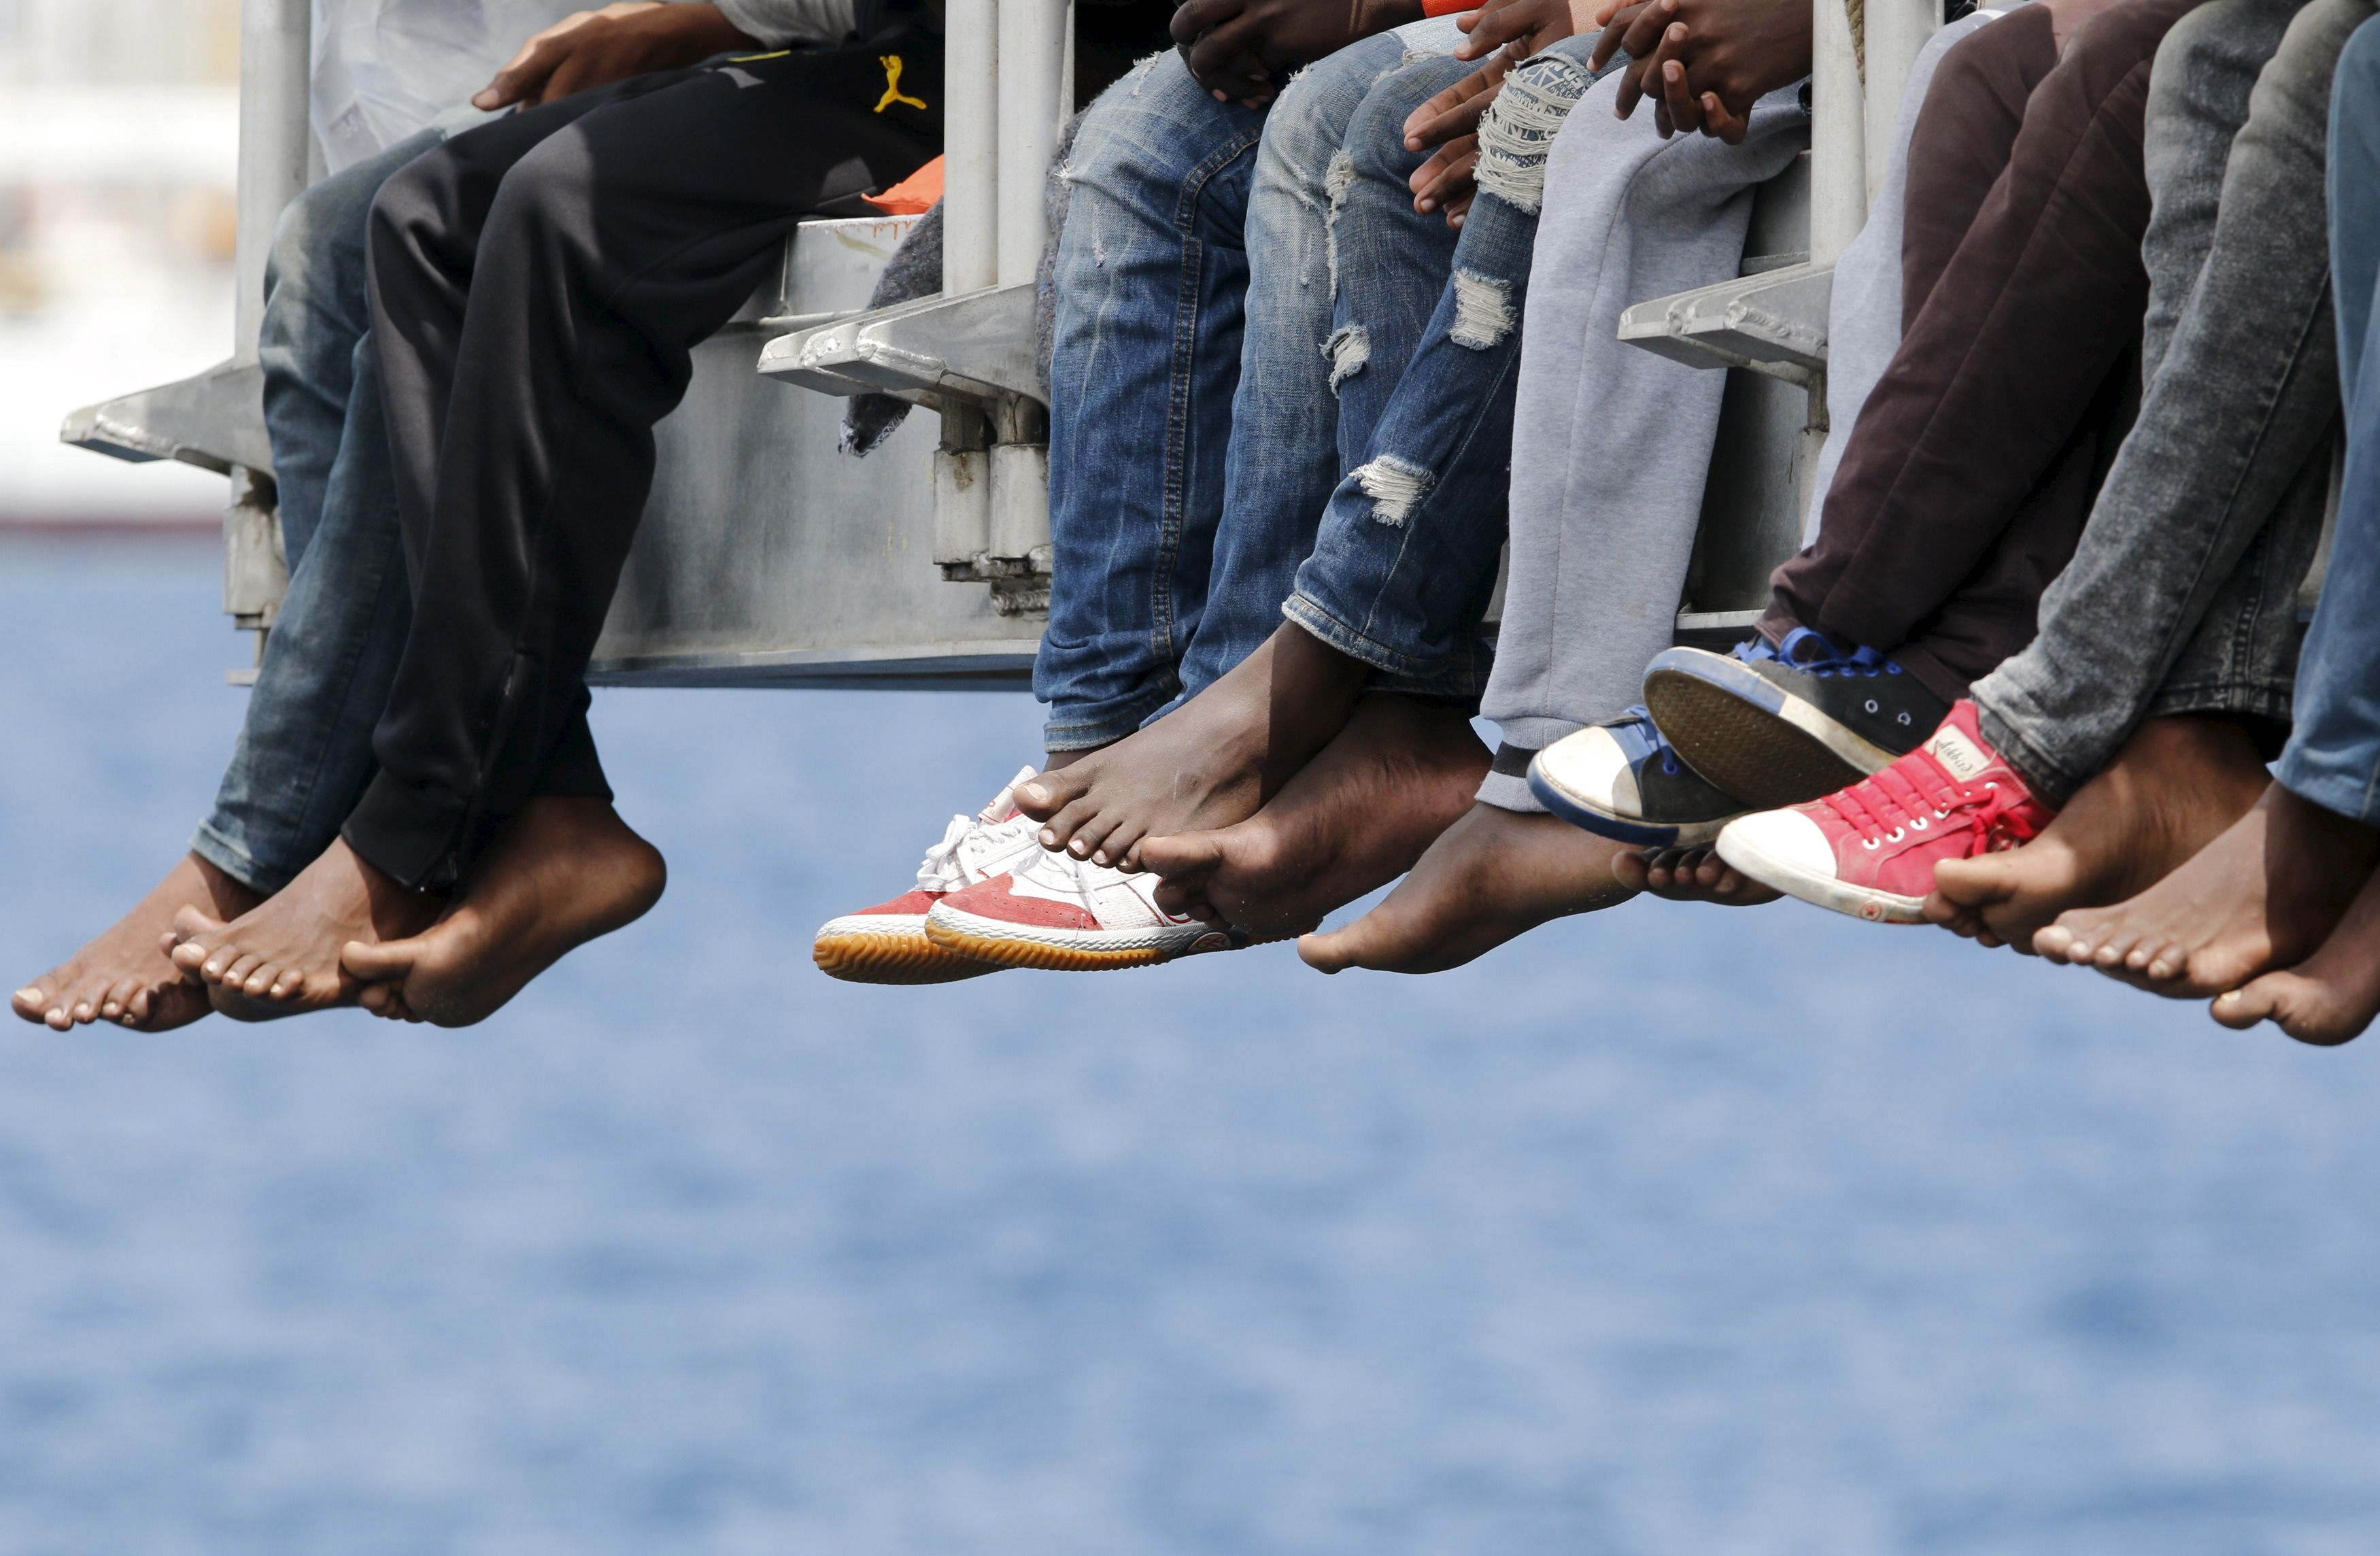 Quand les migrants prennent d'assaut les trains du nord de l'Italie